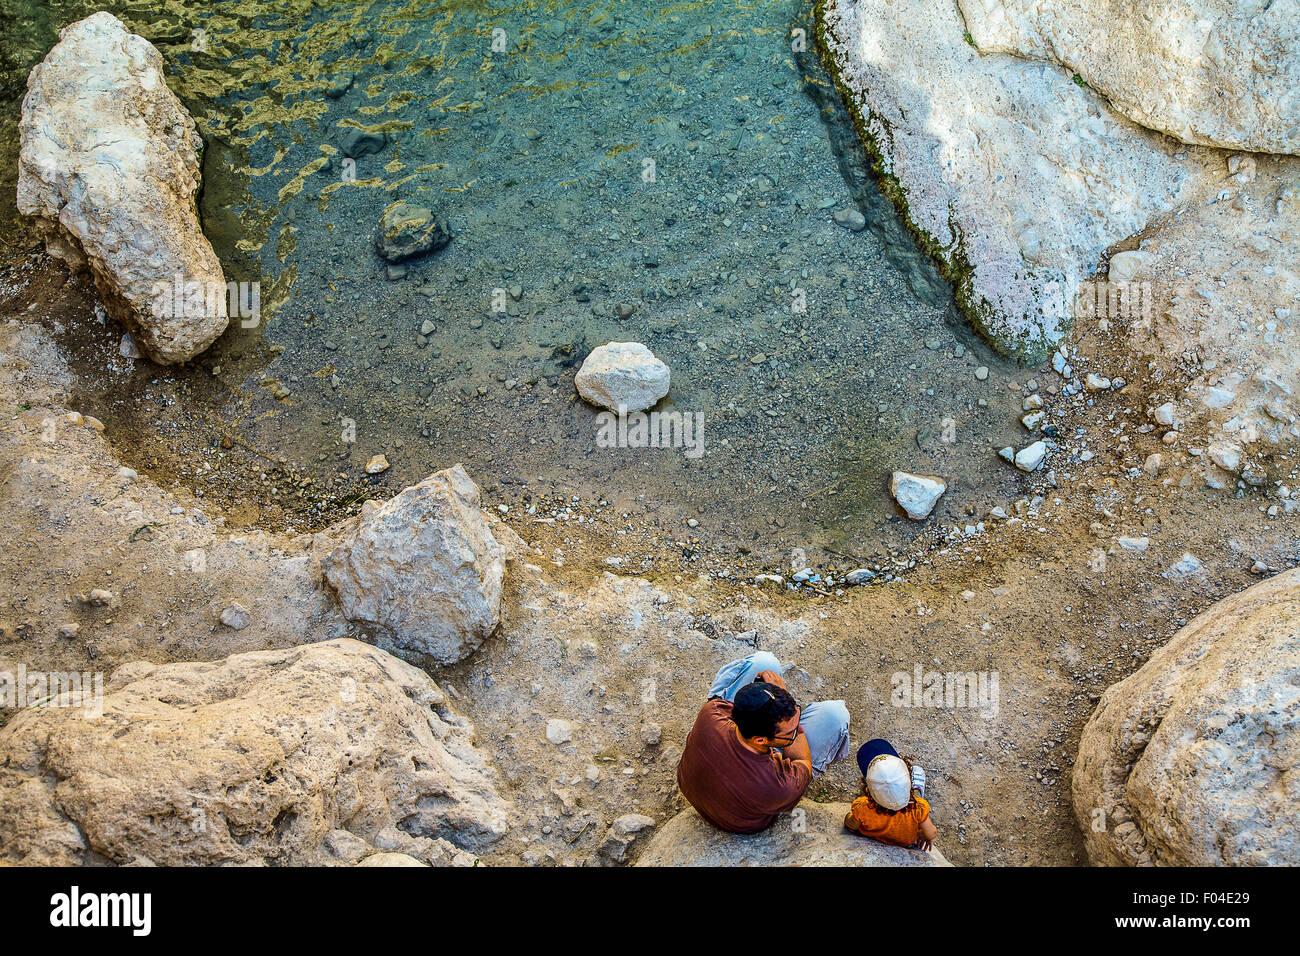 Israel, Jerusalem, people in the En Gedi natural reserve - Stock Image